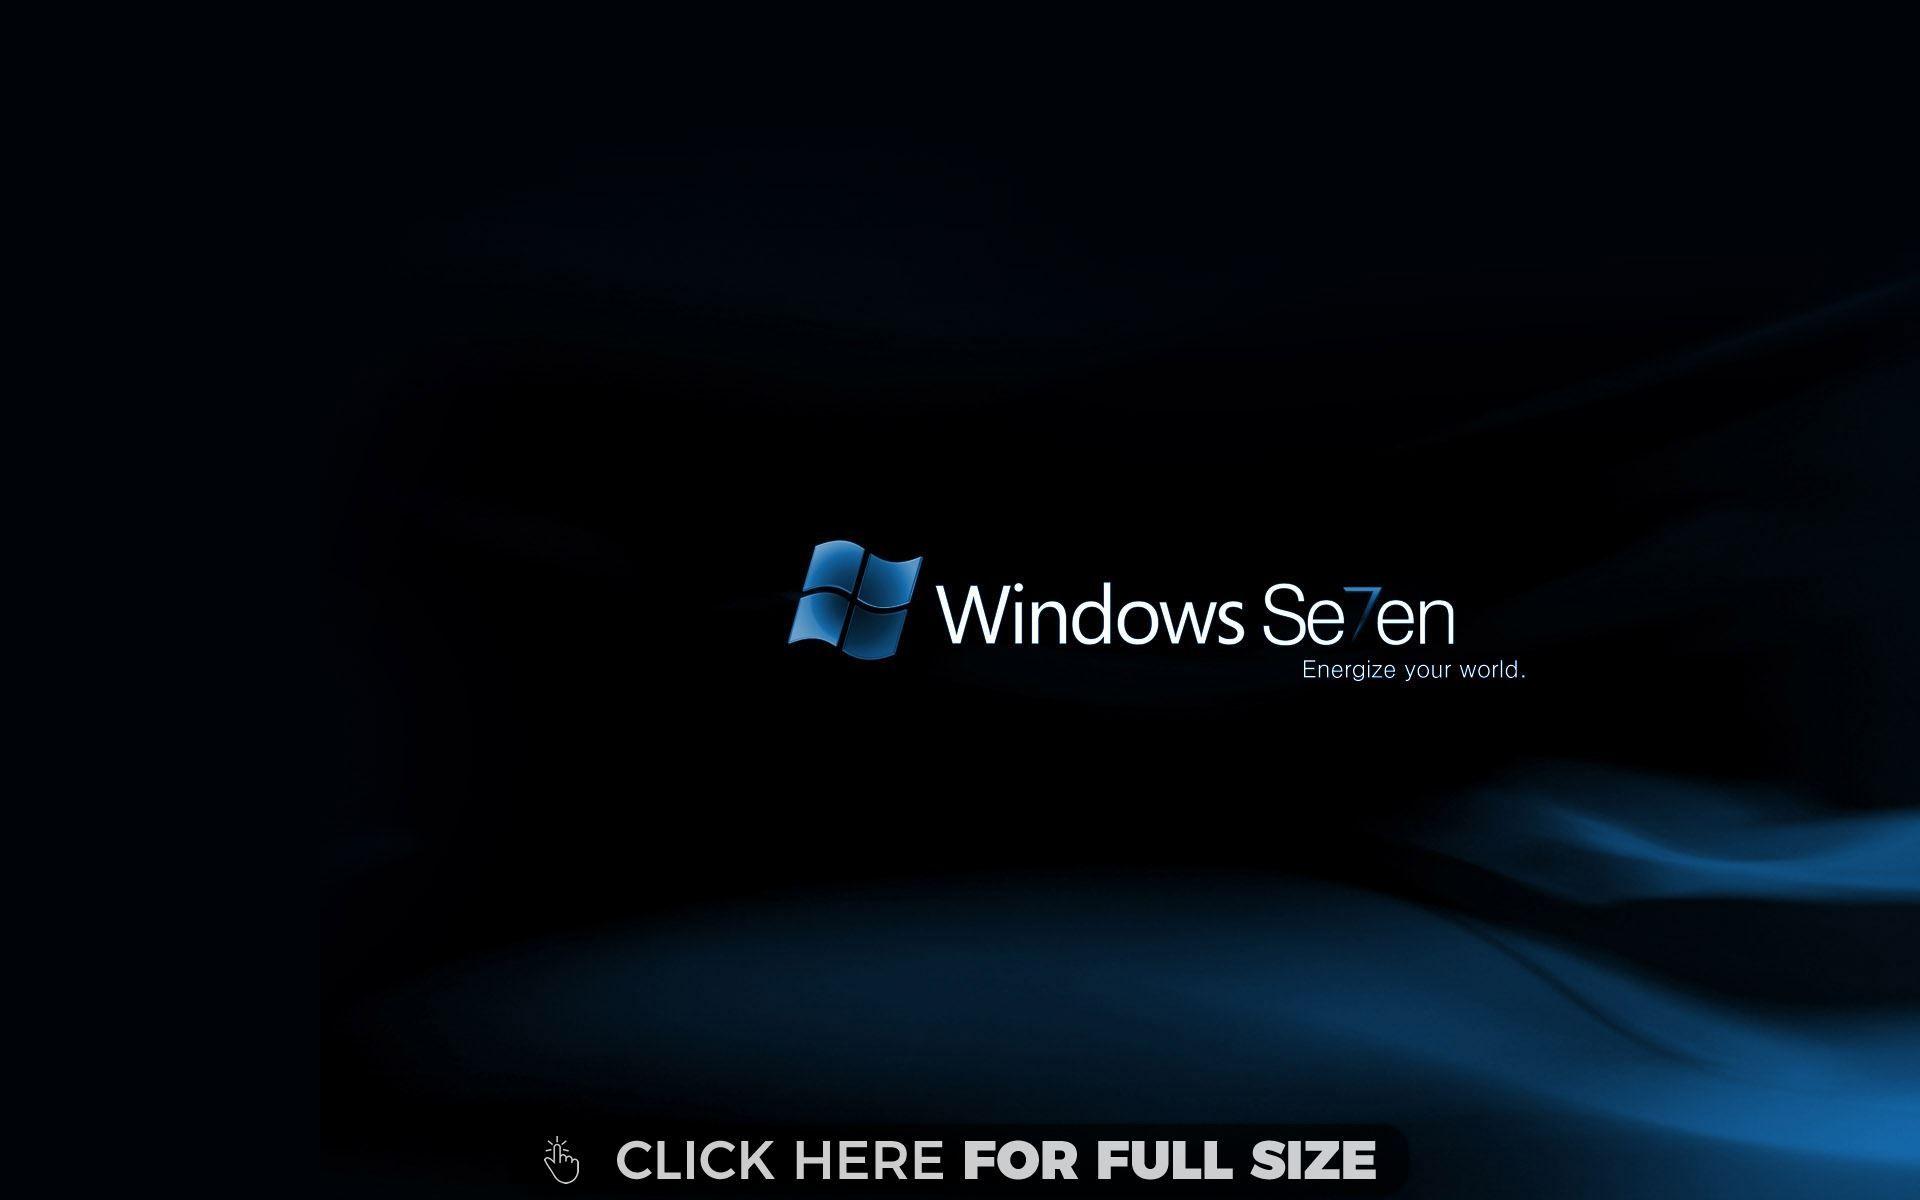 Fondos Windows Ultimate Wallpaper Windows Desktop Wallpaper Desktop Themes Windows